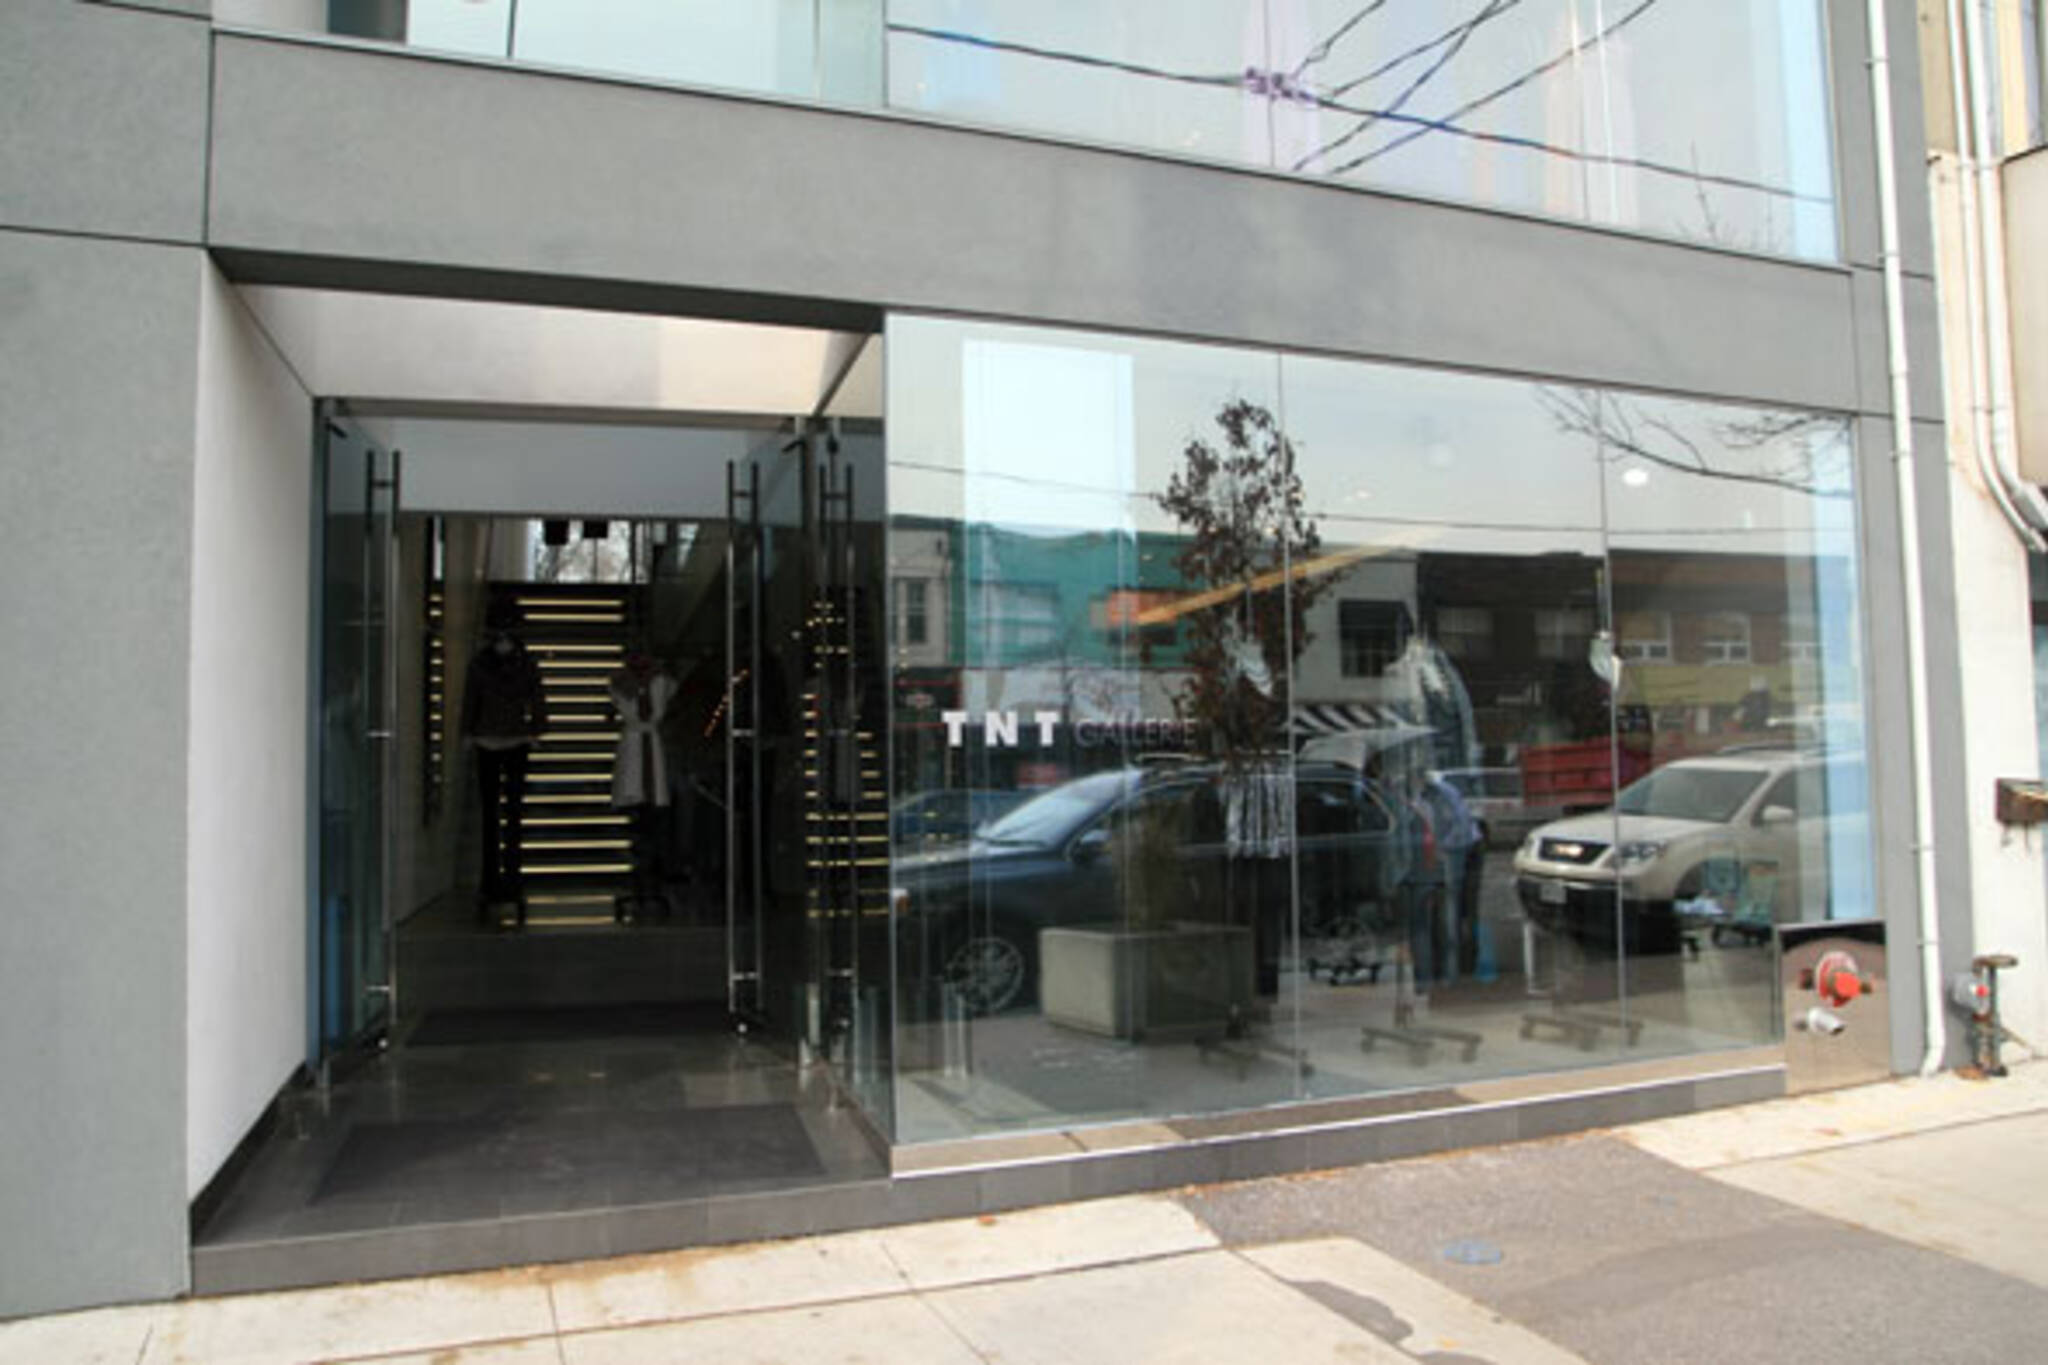 TNT Gallerie Toronto